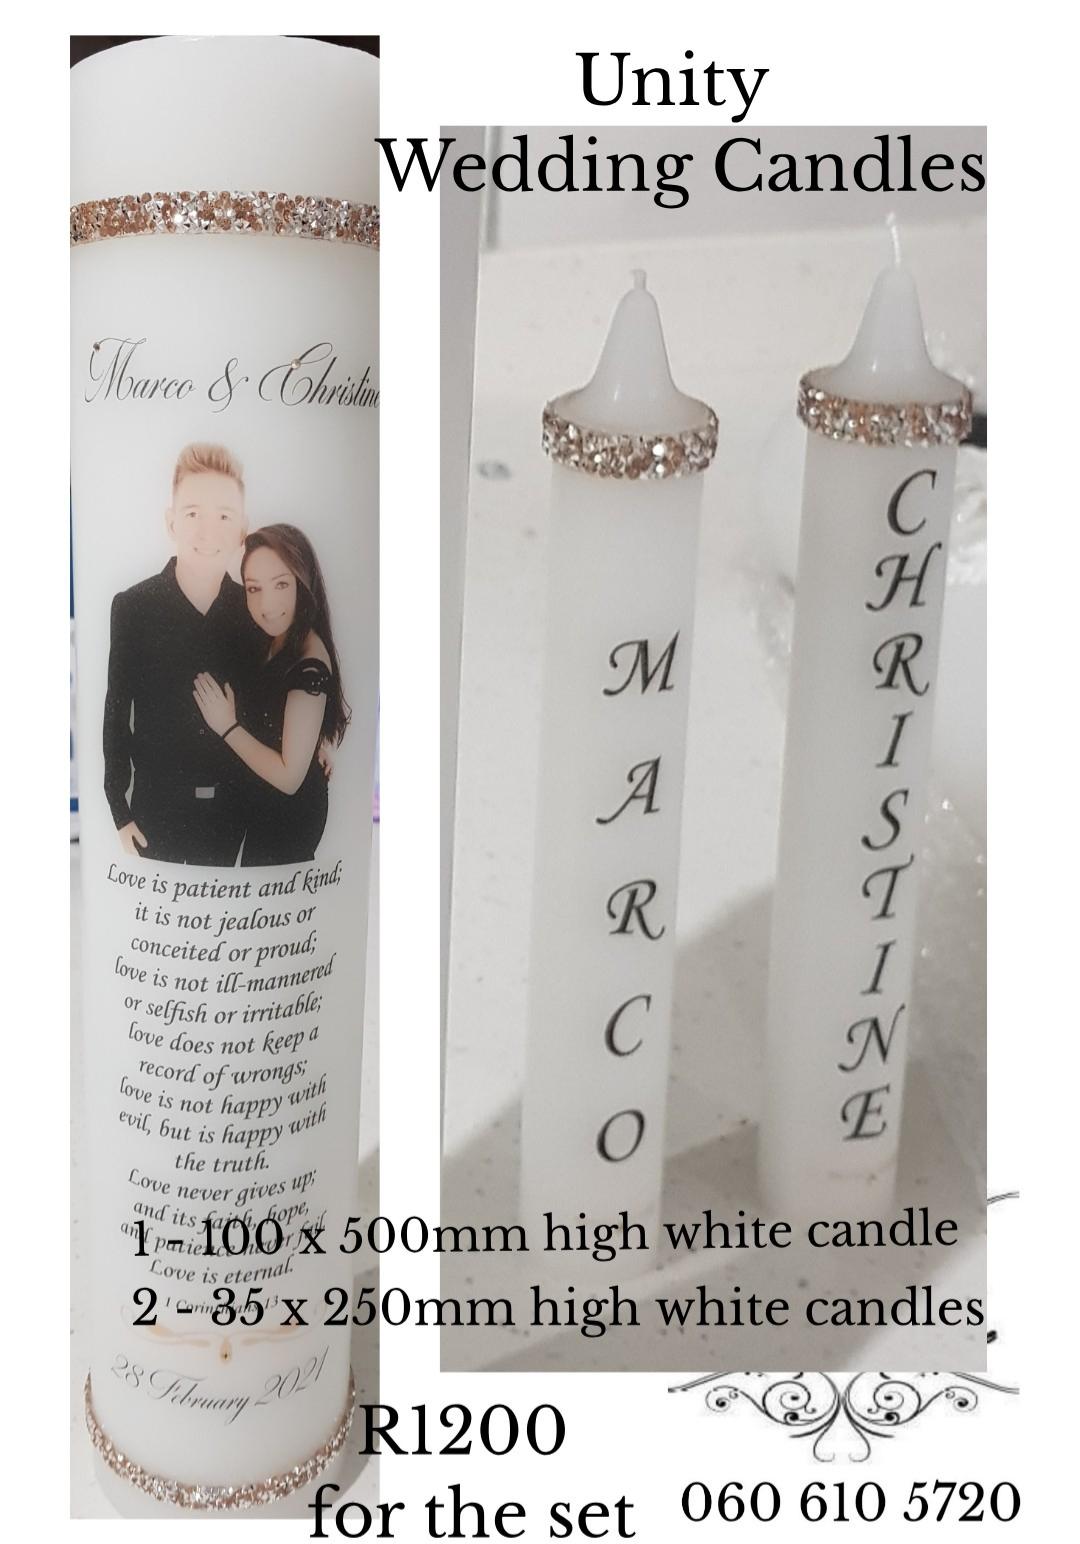 Unity Wedding Candles